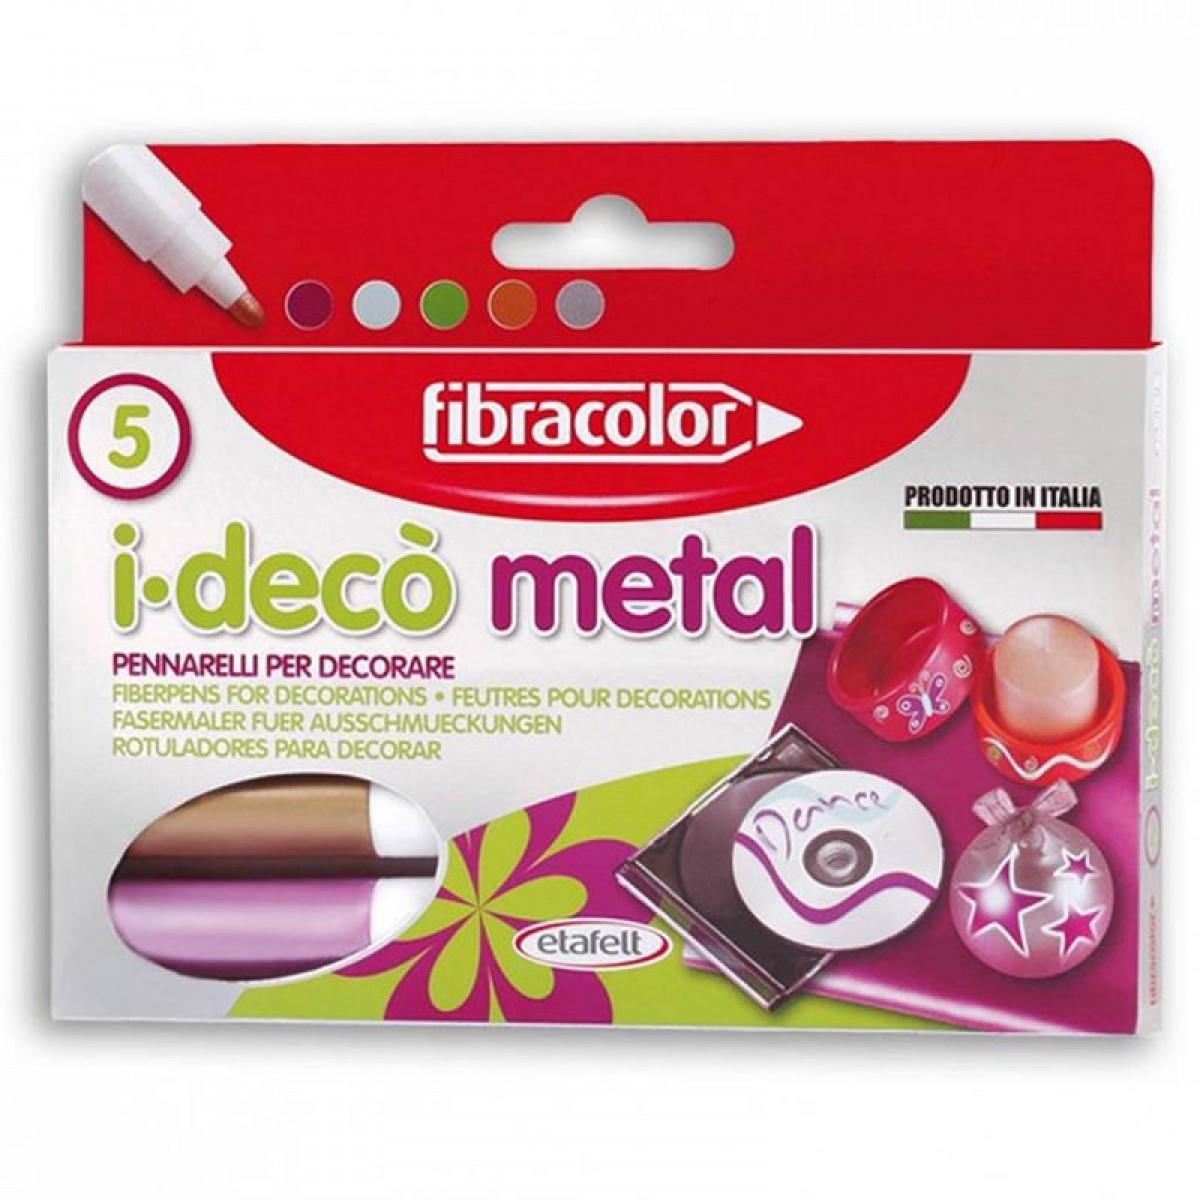 Fibracolor Μαρκαδόροι Ανεξίτηλοι Μεταλλικά Χρώματα (5 Τεμ.) Μαρκαδόροι